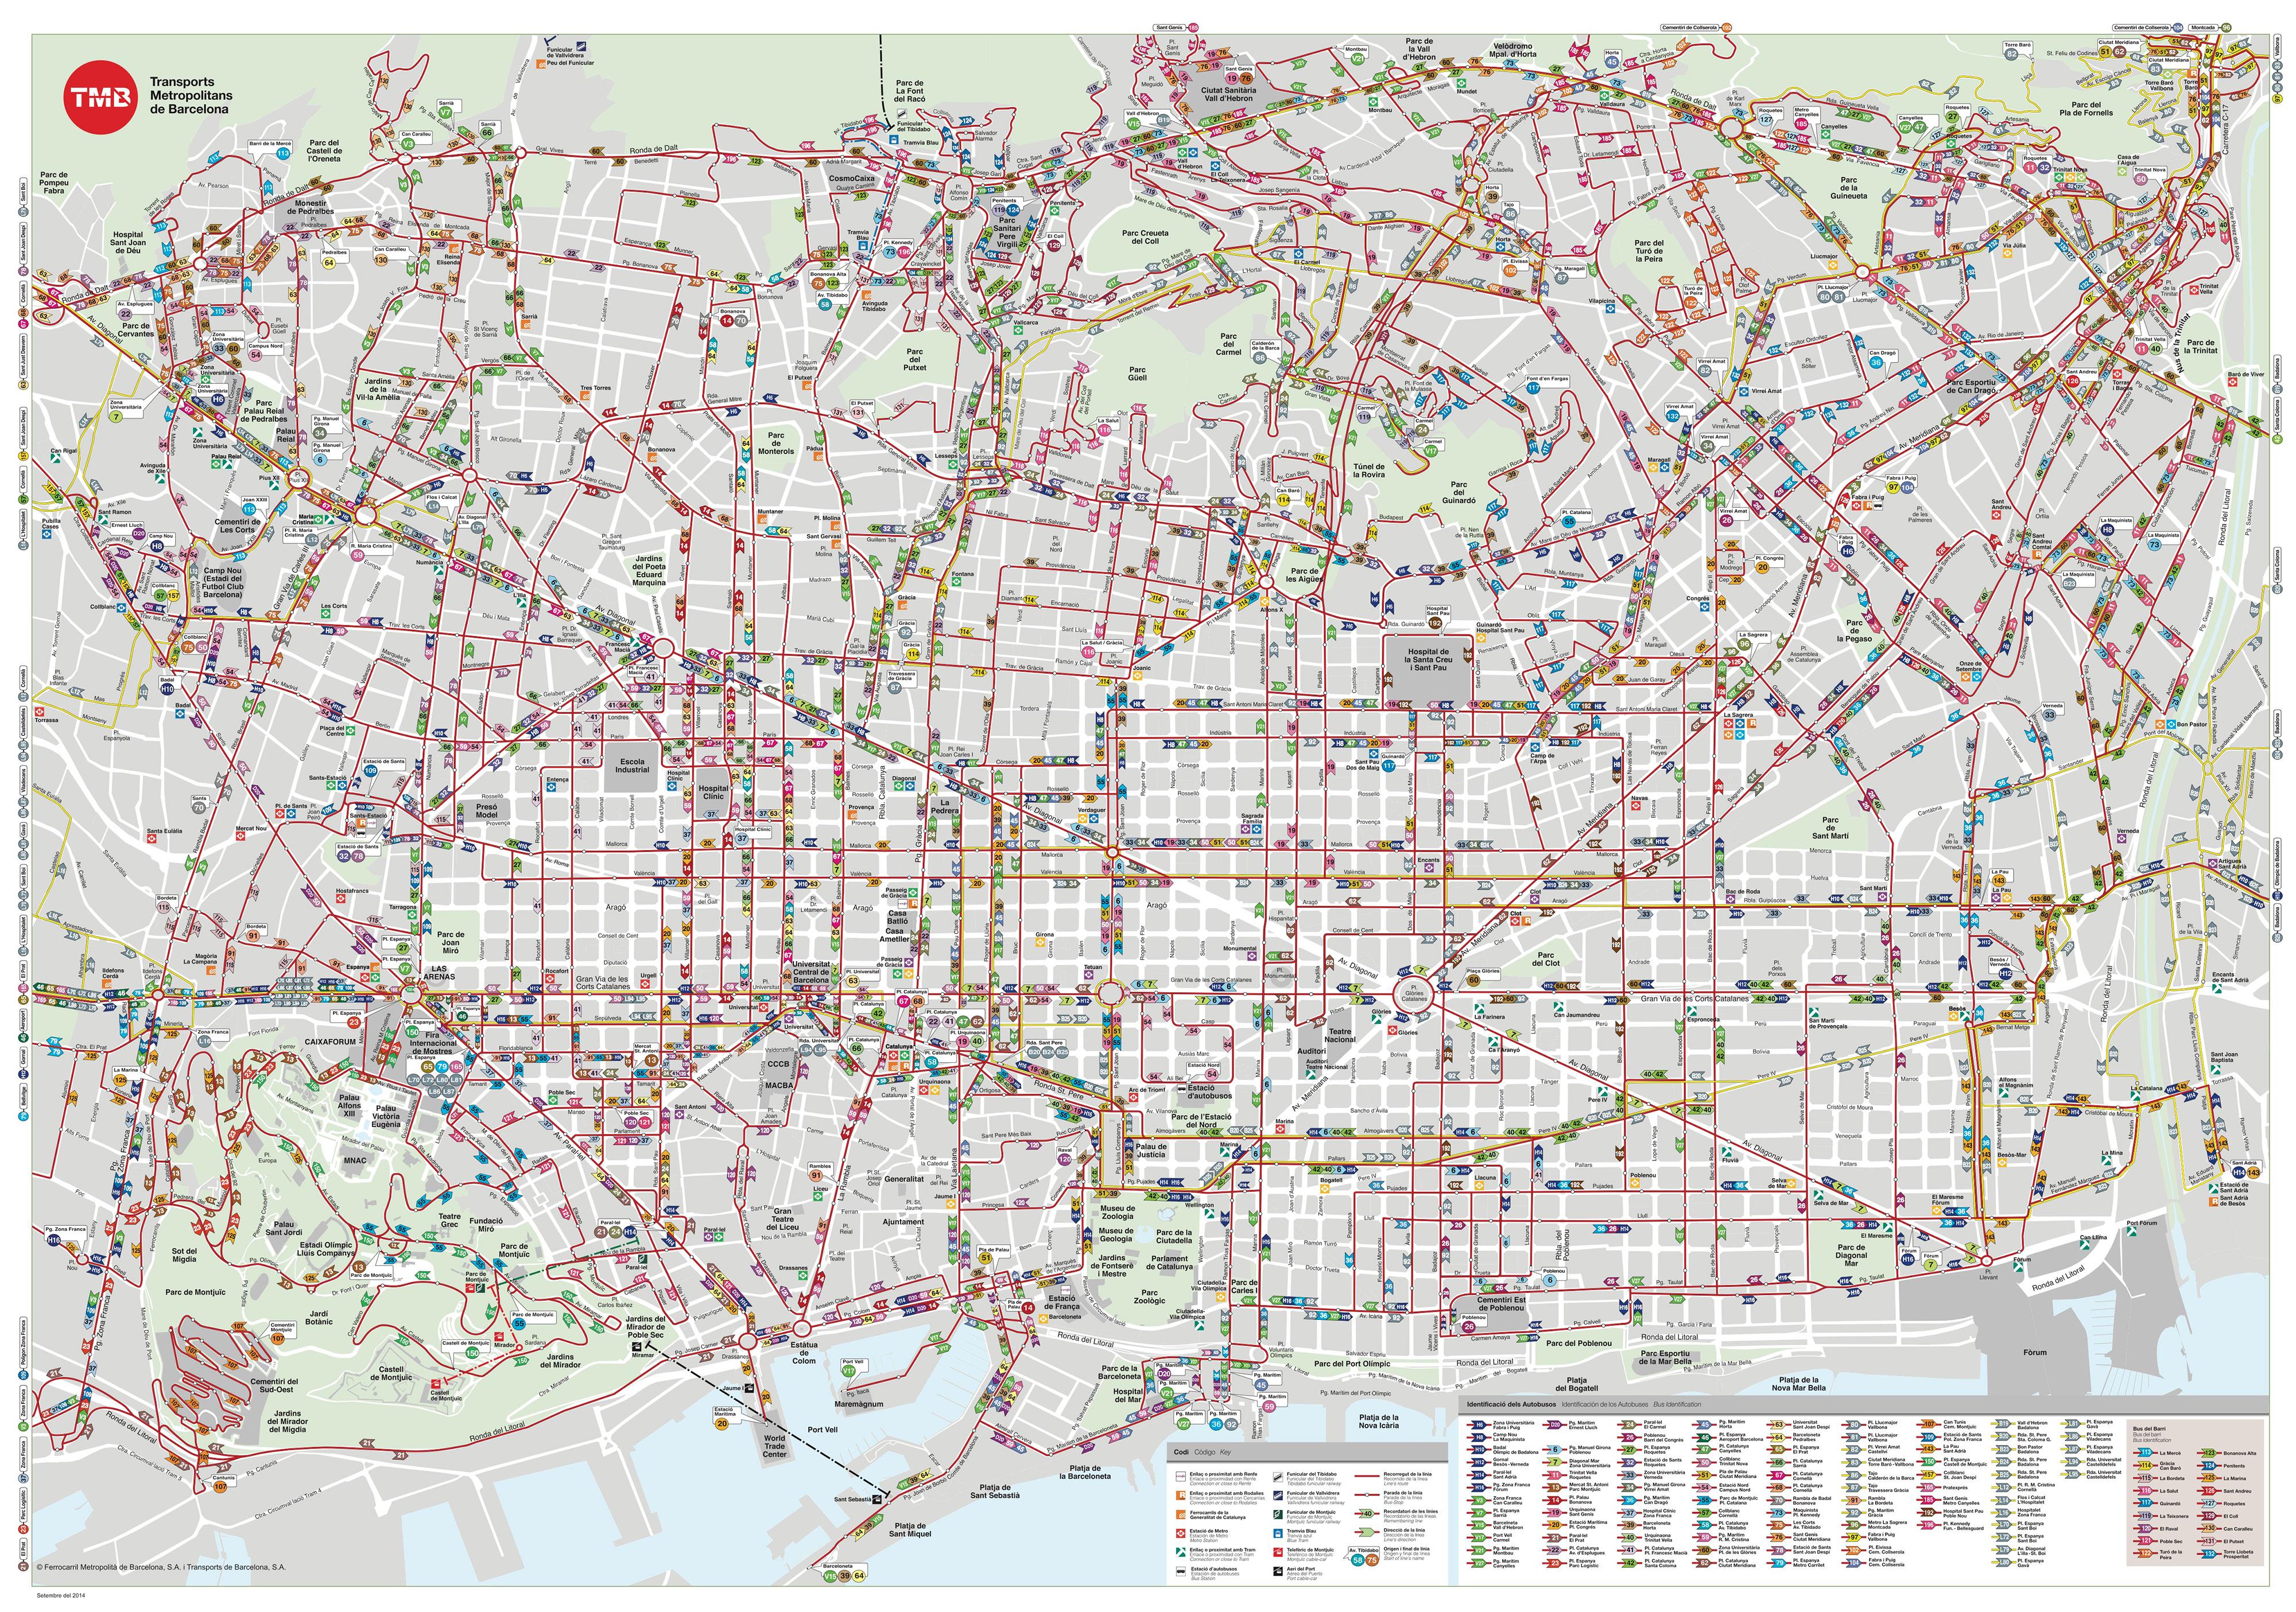 Plano de Autobuses urbanos de Barcelona (TMB)